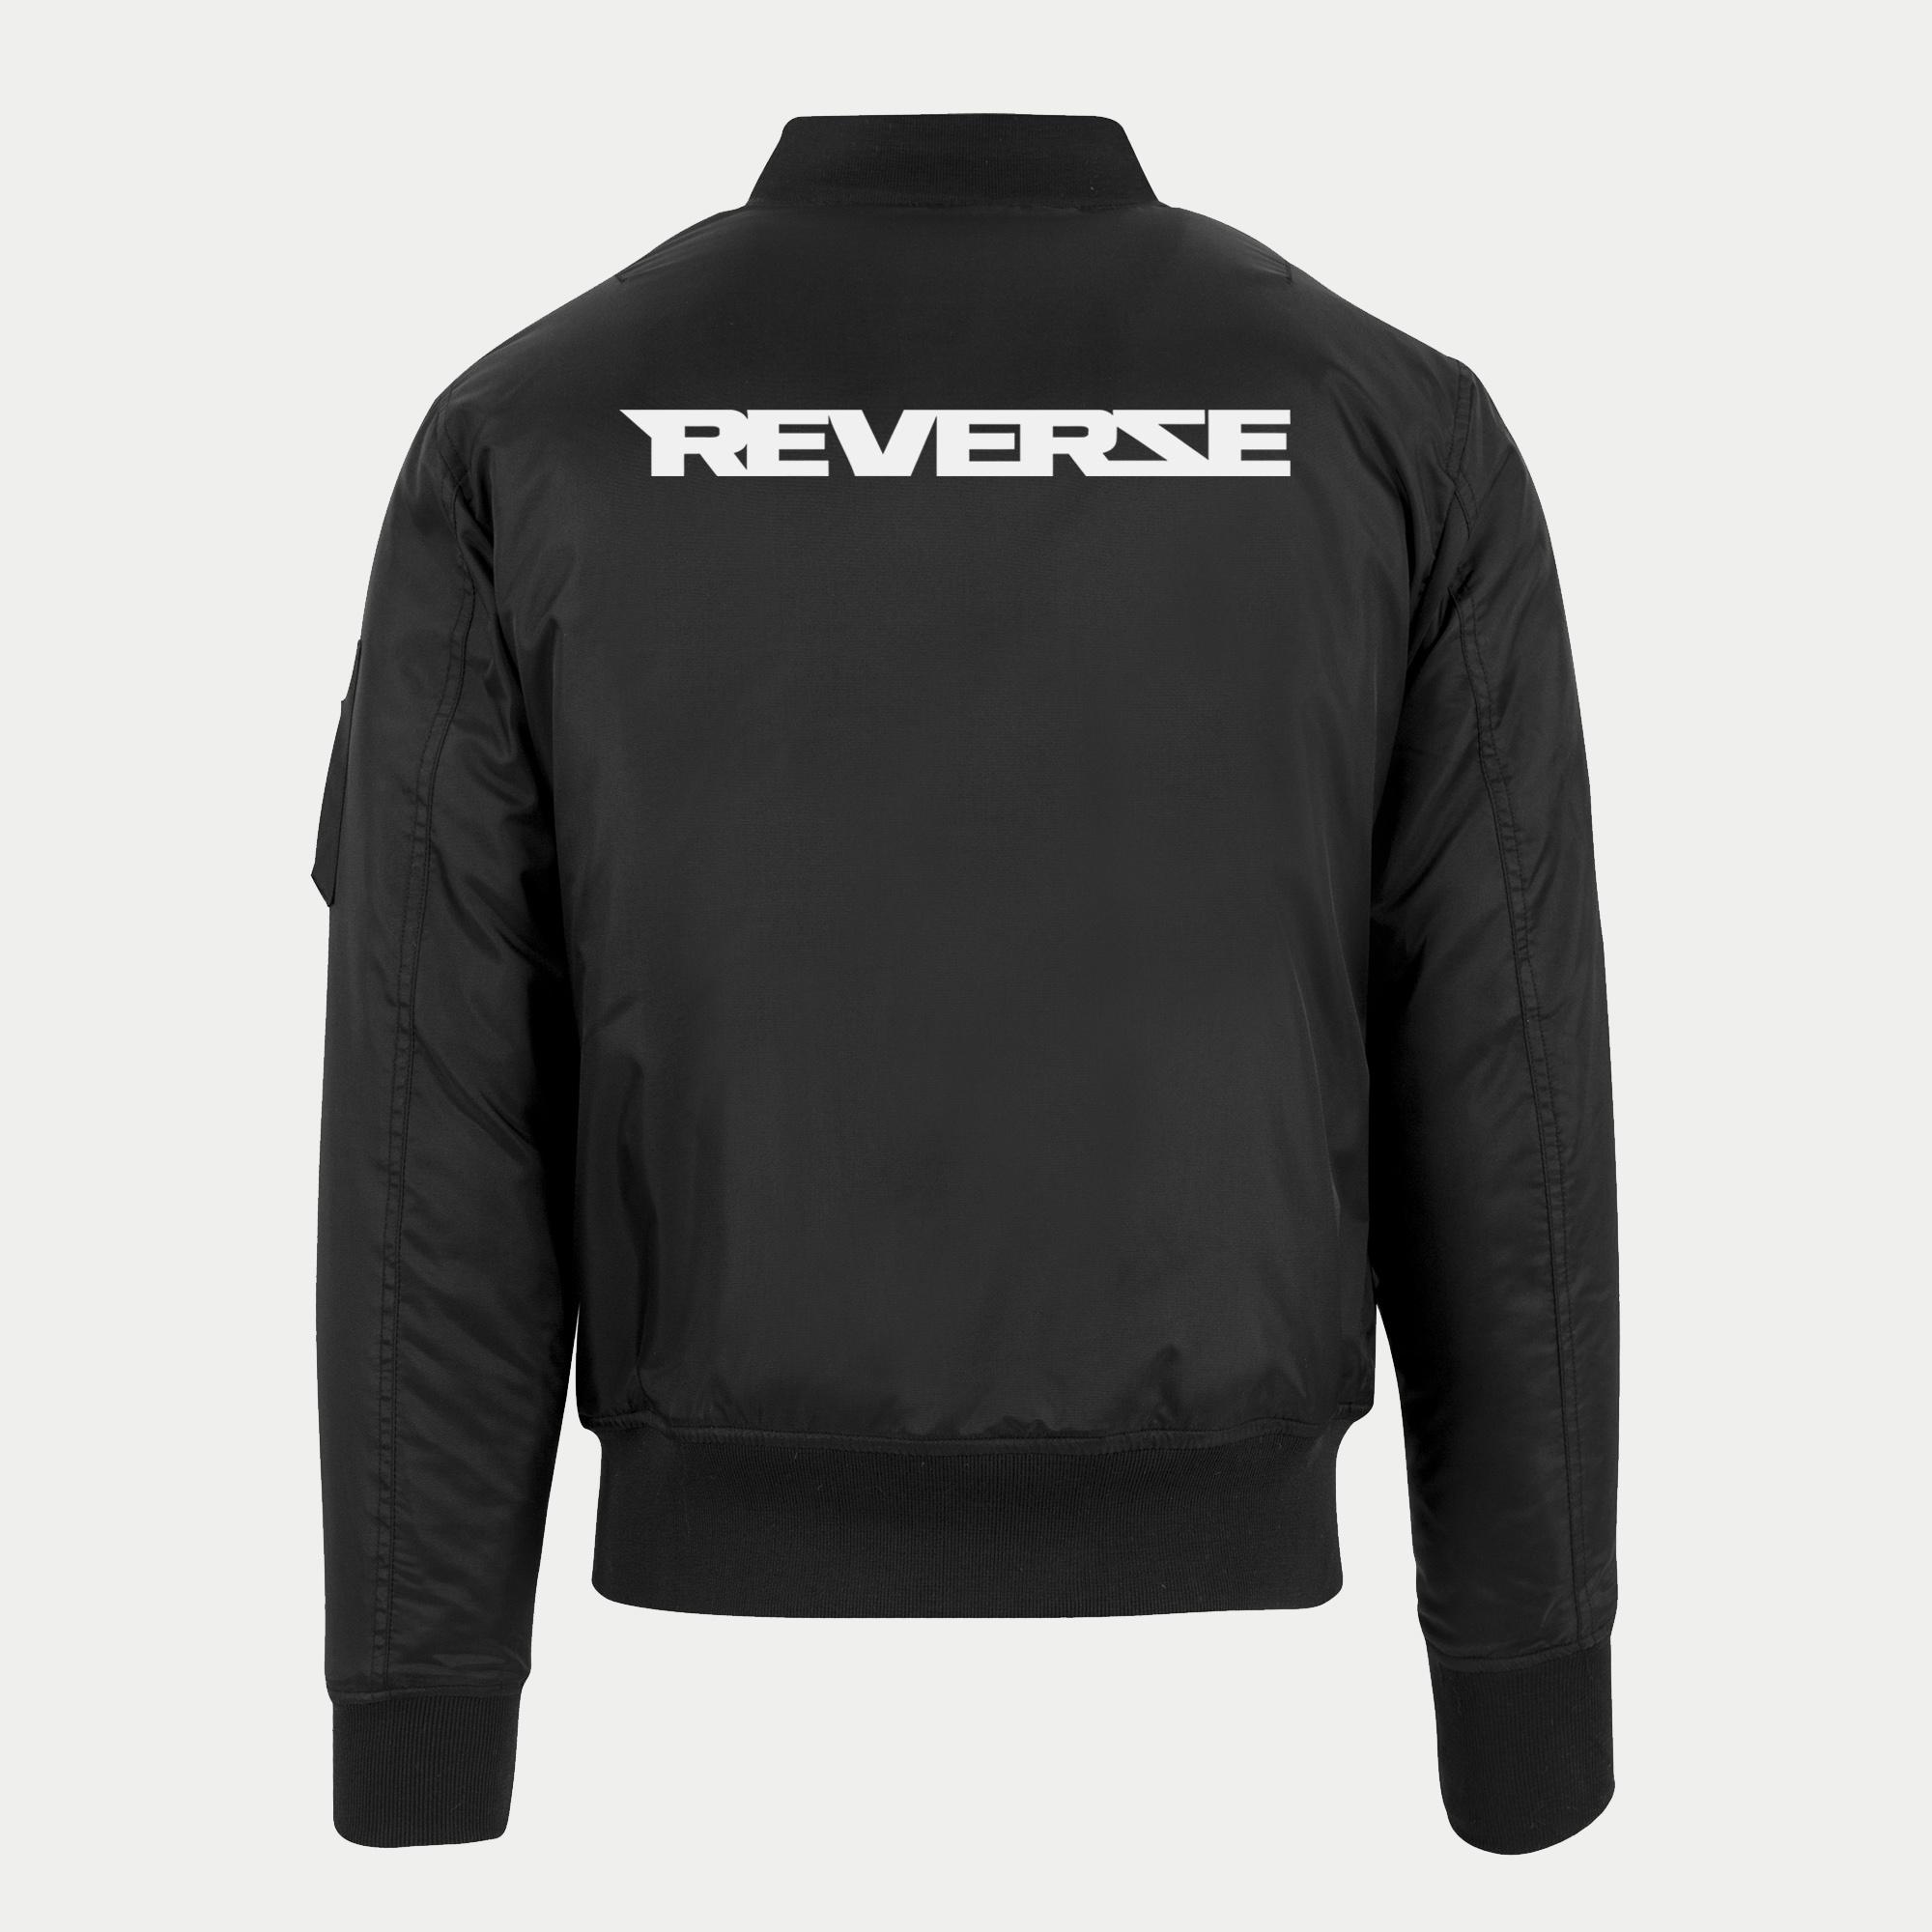 Reverze - Classic Black Jacket